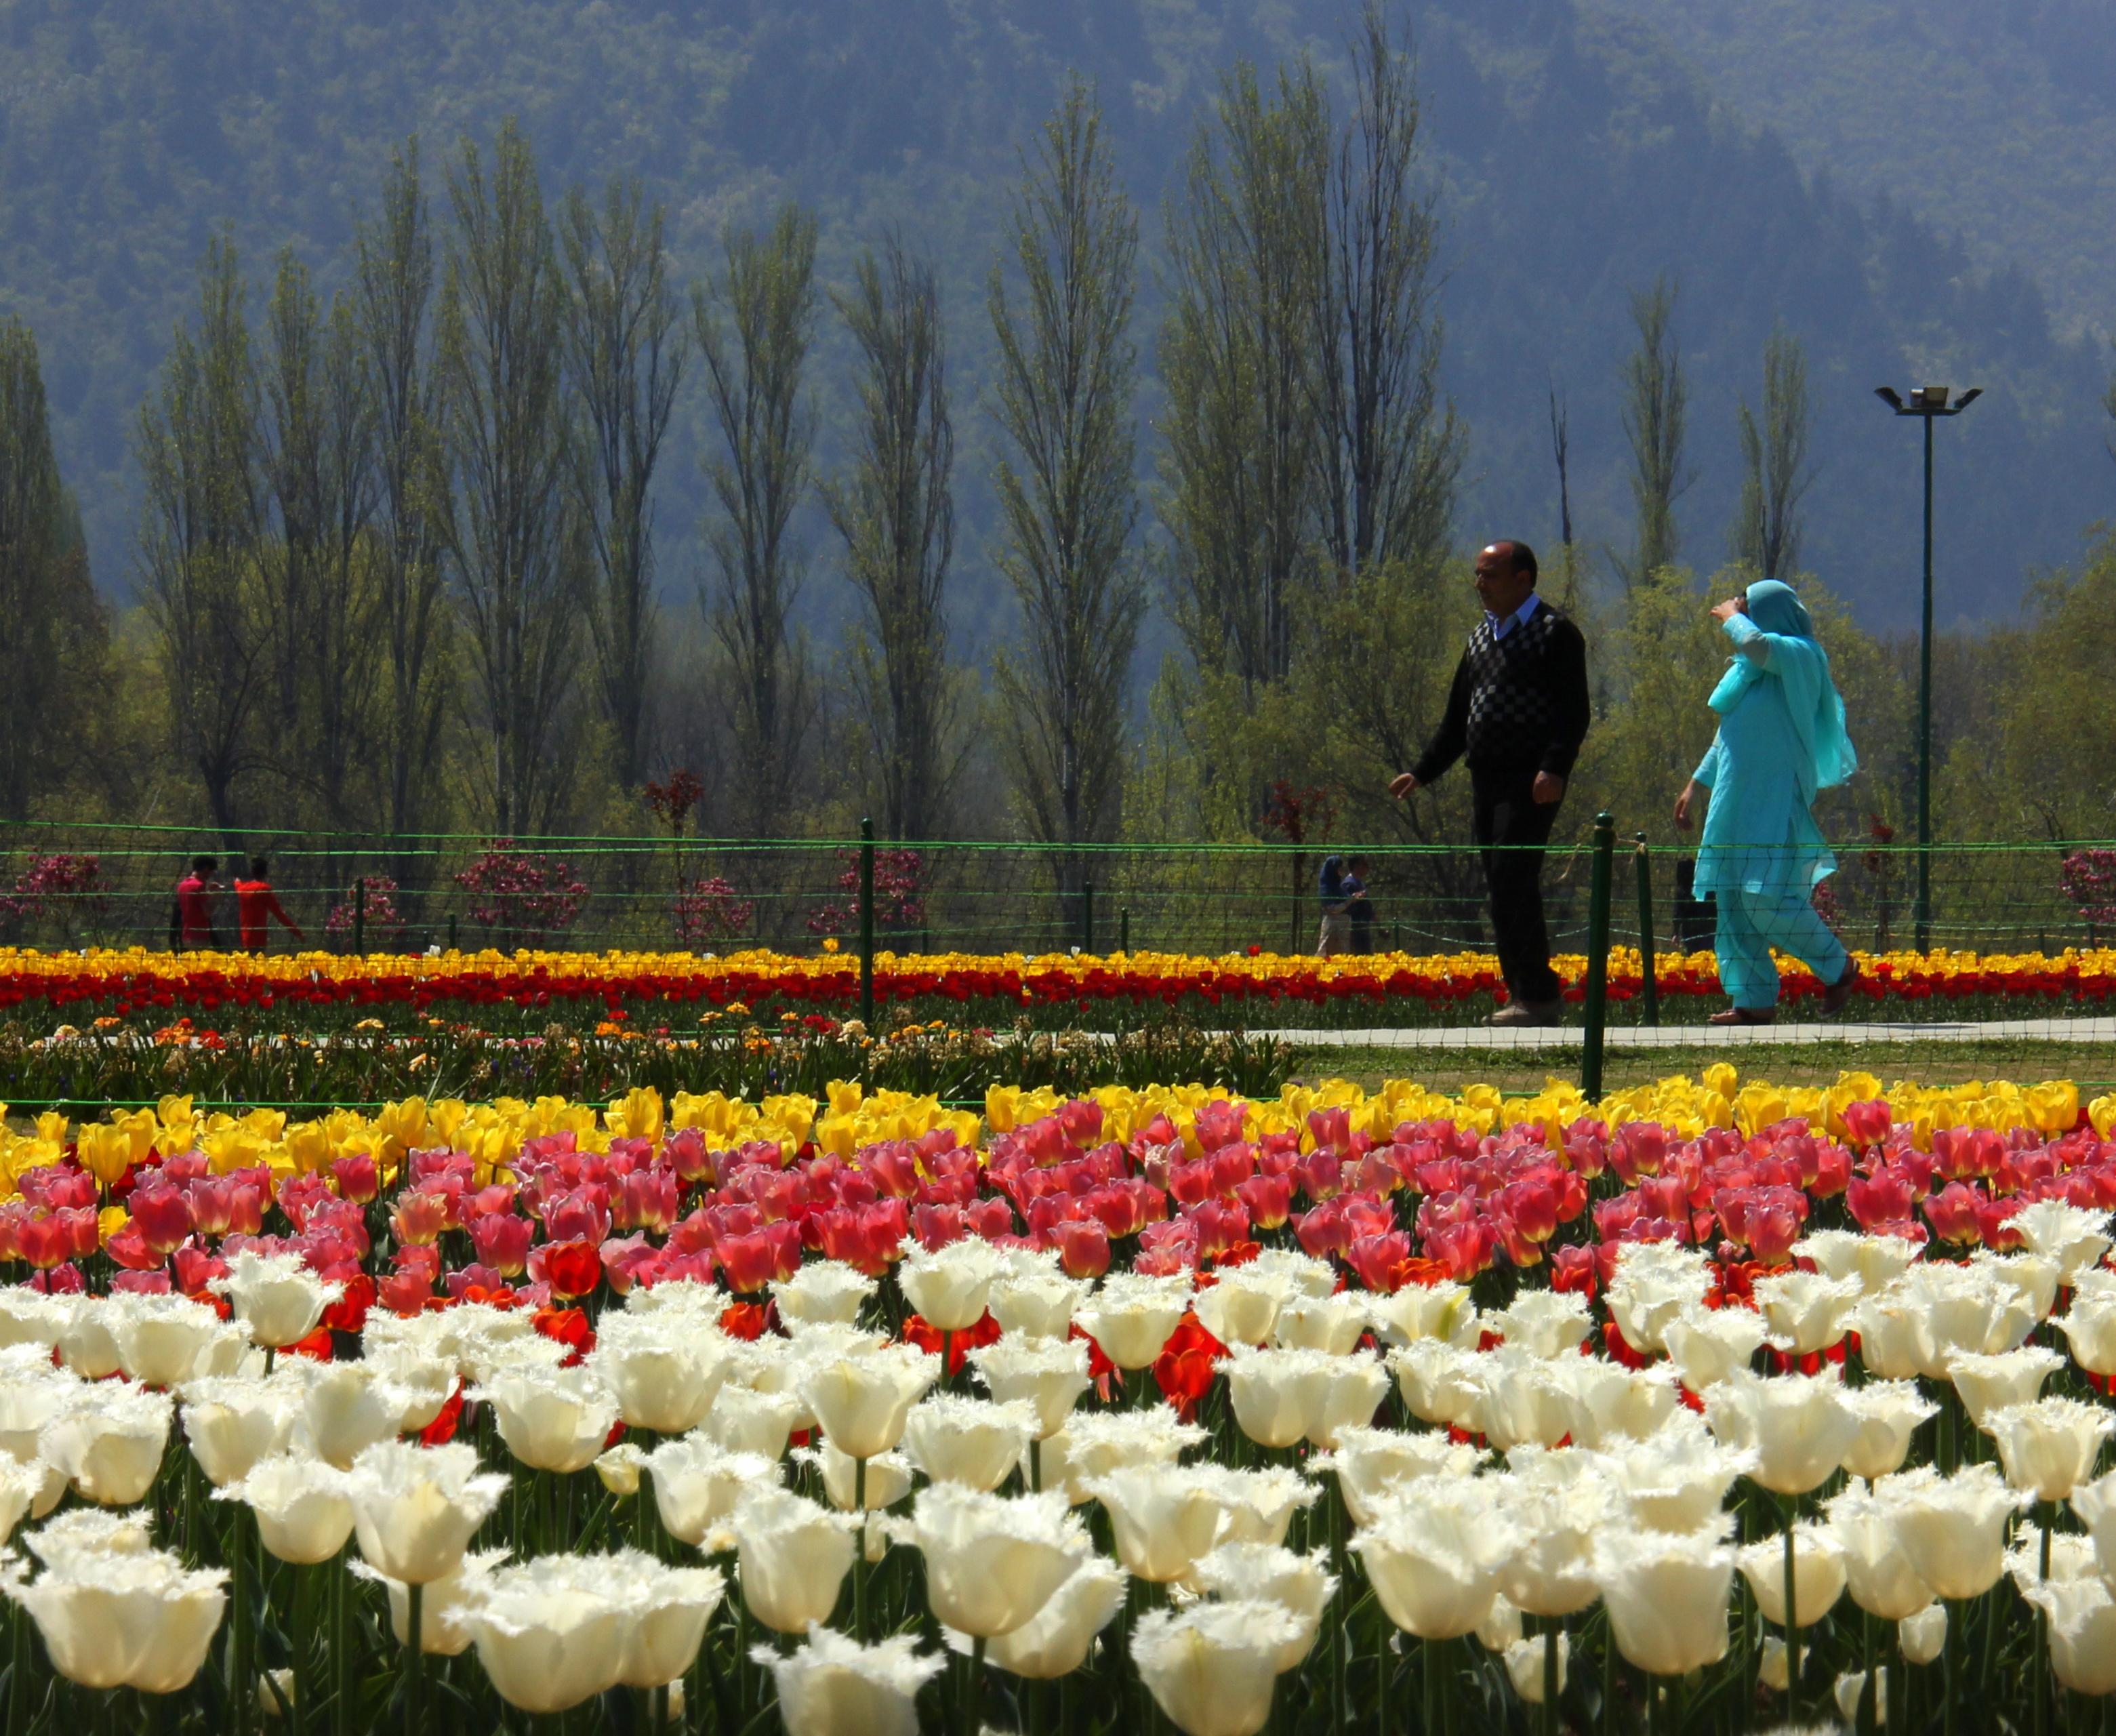 Srinagar tulip festival is best viewed in april